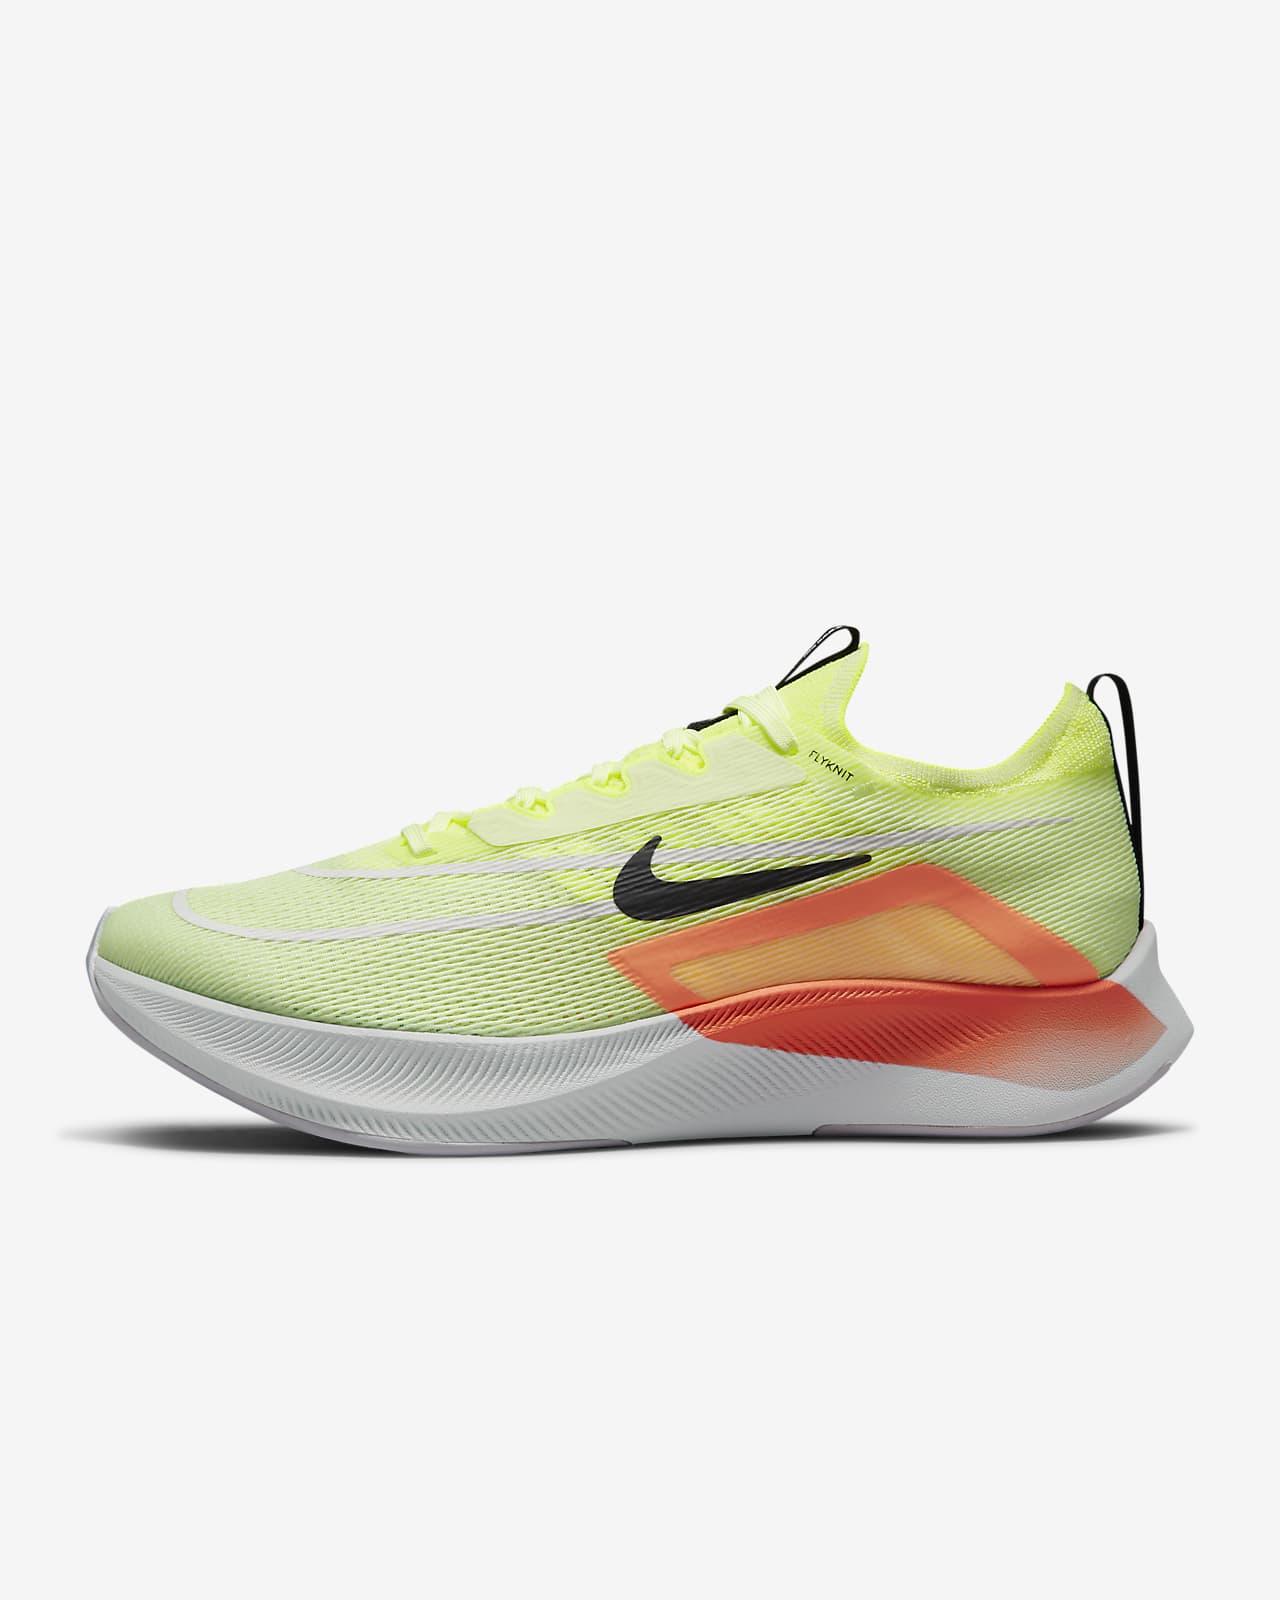 Мужские кроссовки для бега по шоссе Nike Zoom Fly 4